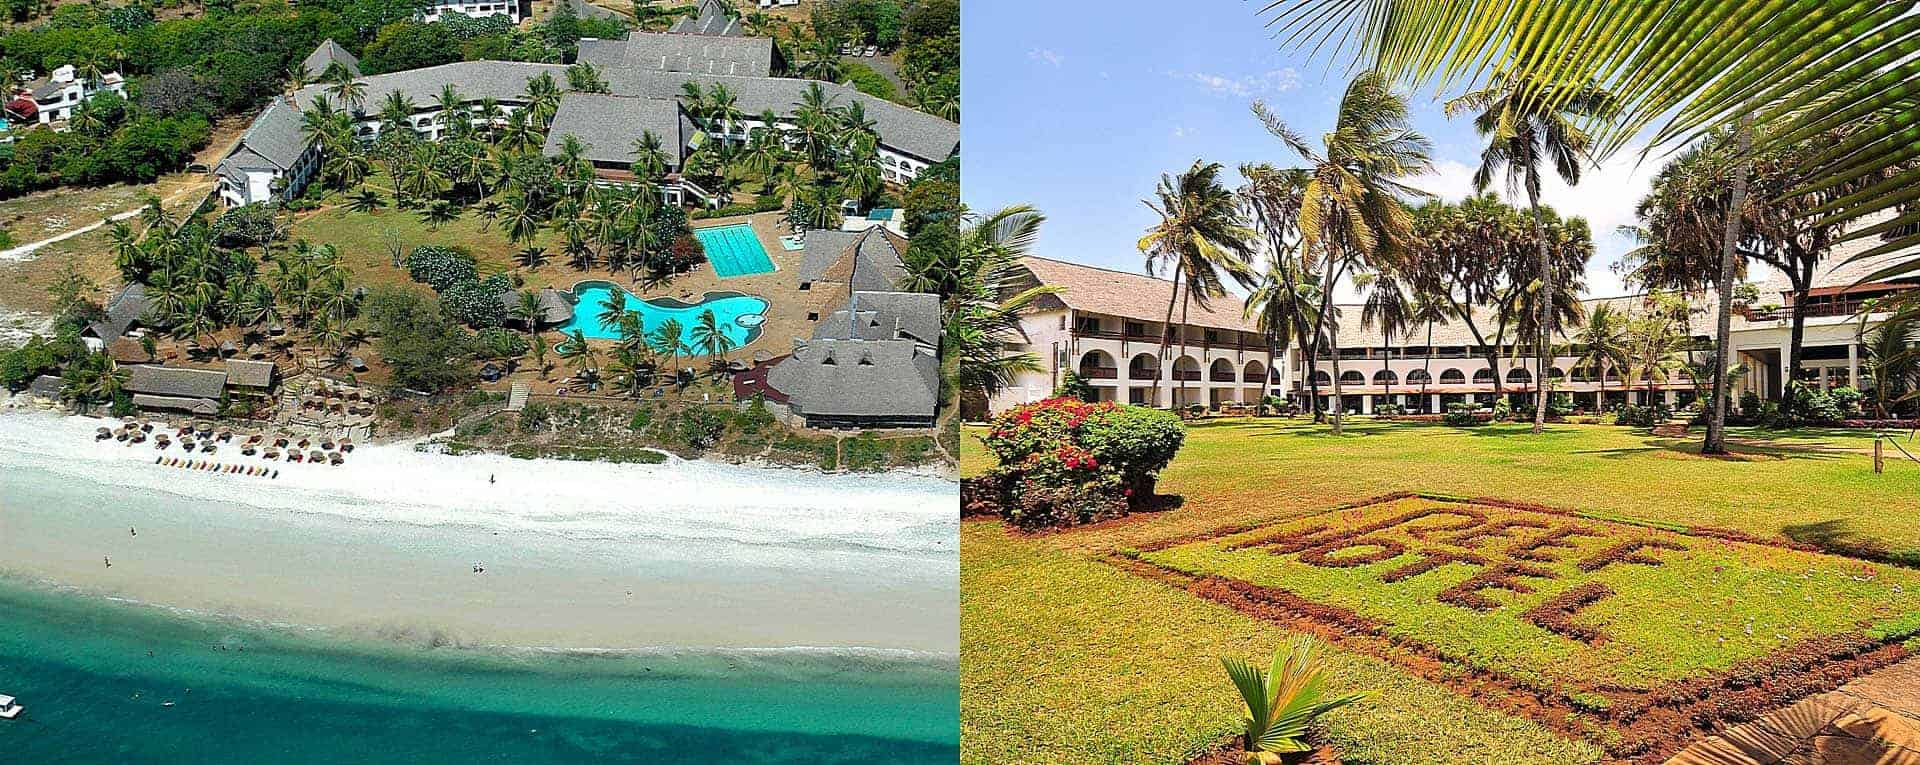 hotel jobs in mombasa kenya